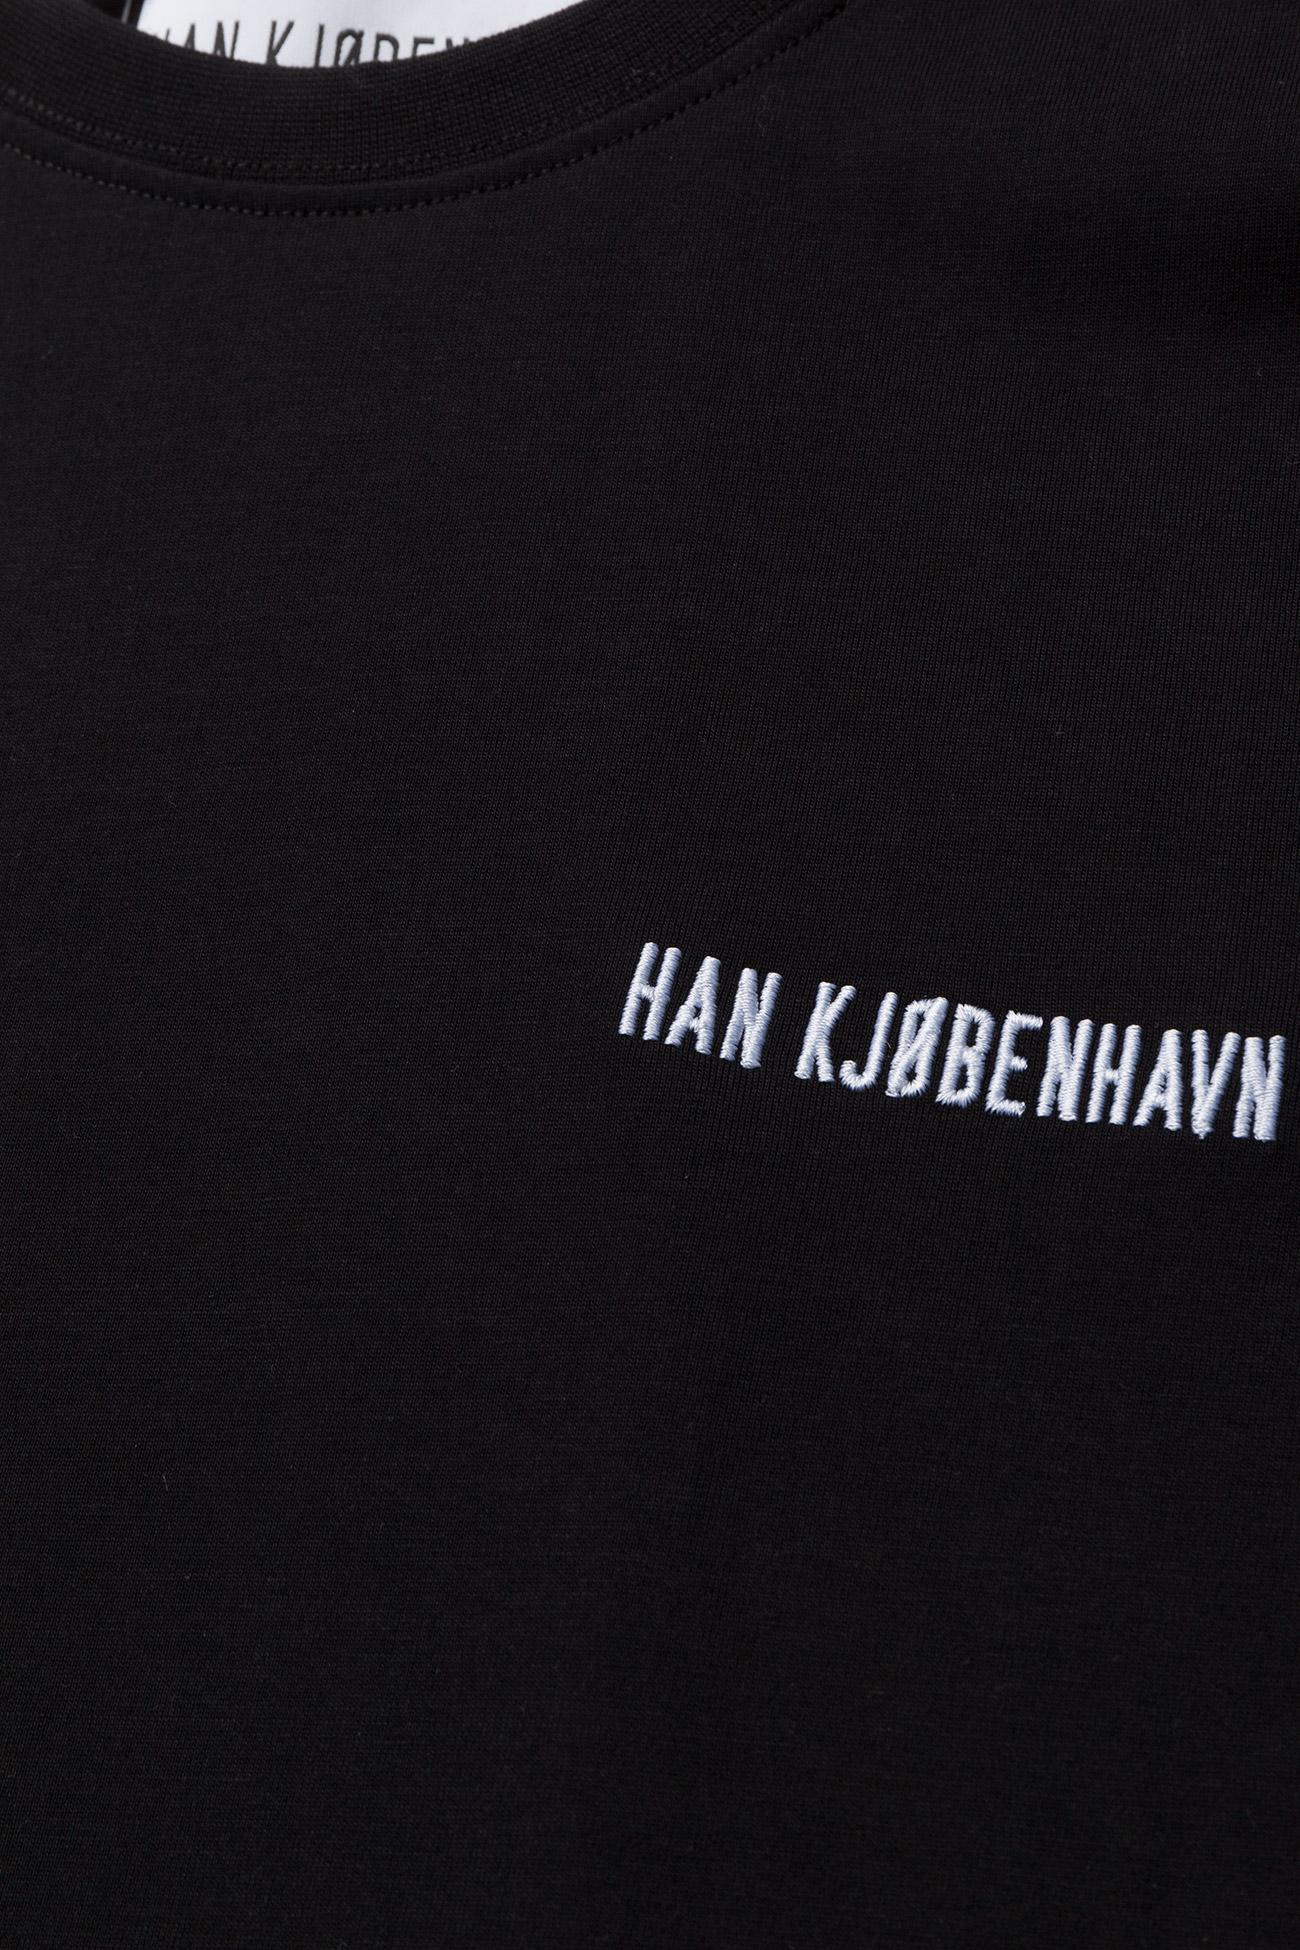 HAN Kjøbenhavn - Casual Tee - korte mouwen - black - 2